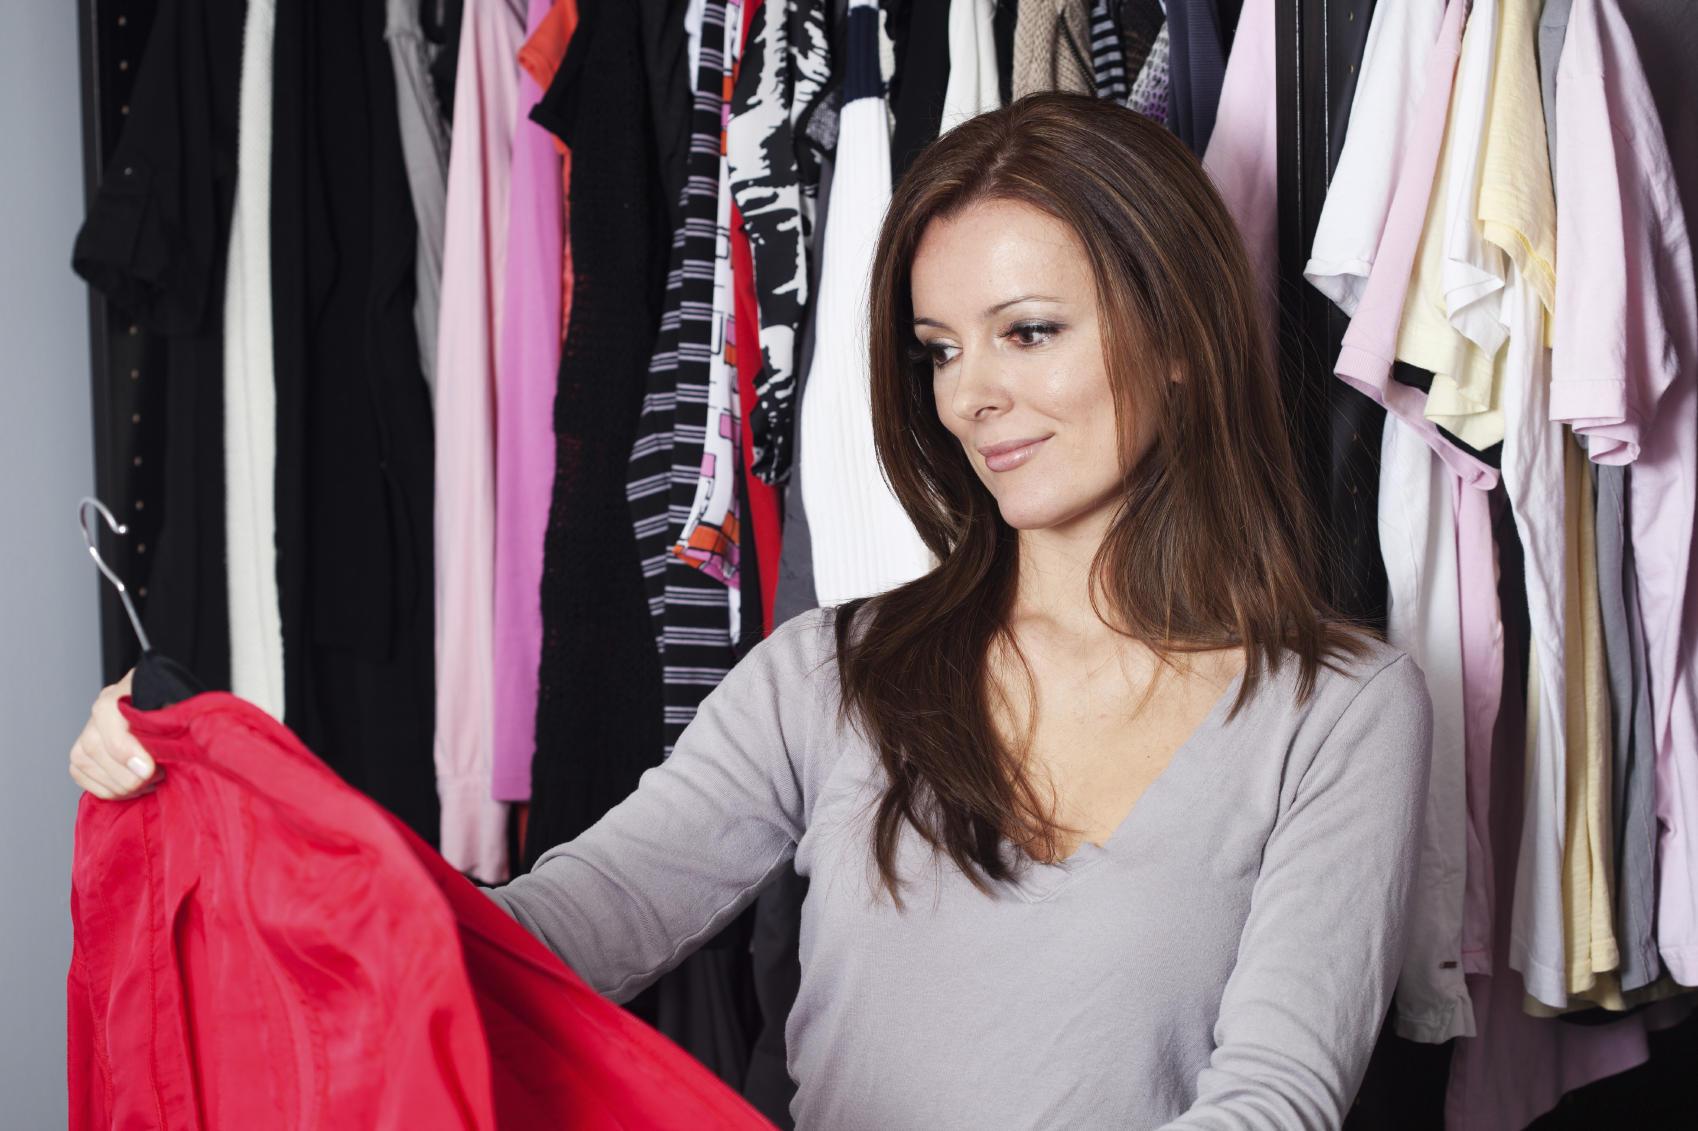 woman-closet-iStock_000020061708_Medium